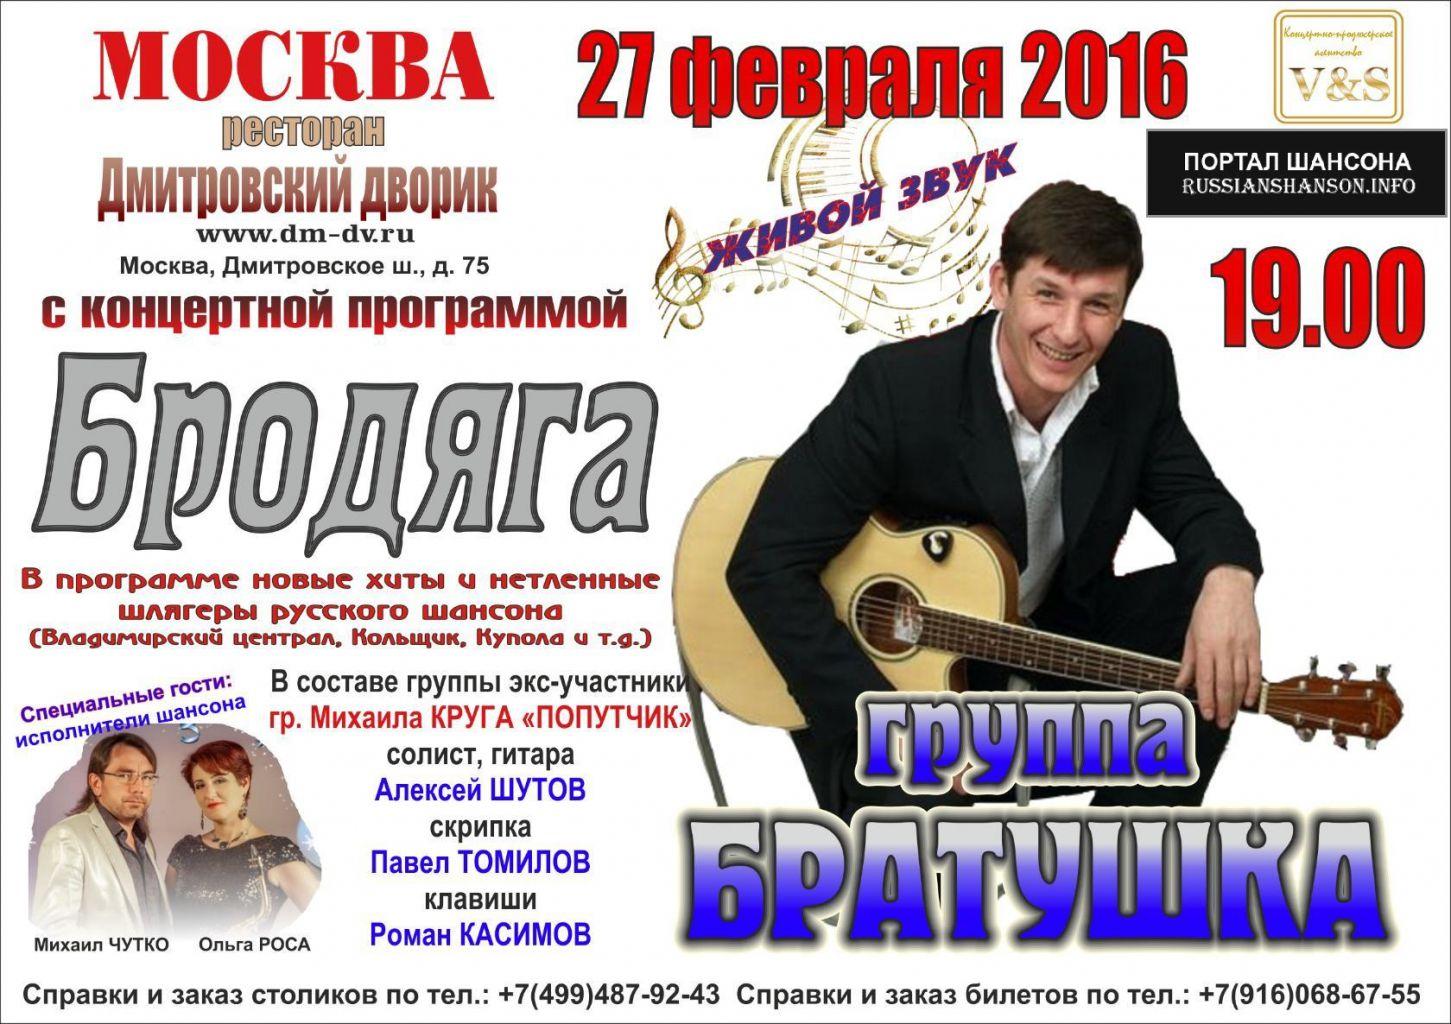 Группа «Братушка» 27 февраля 2016 года